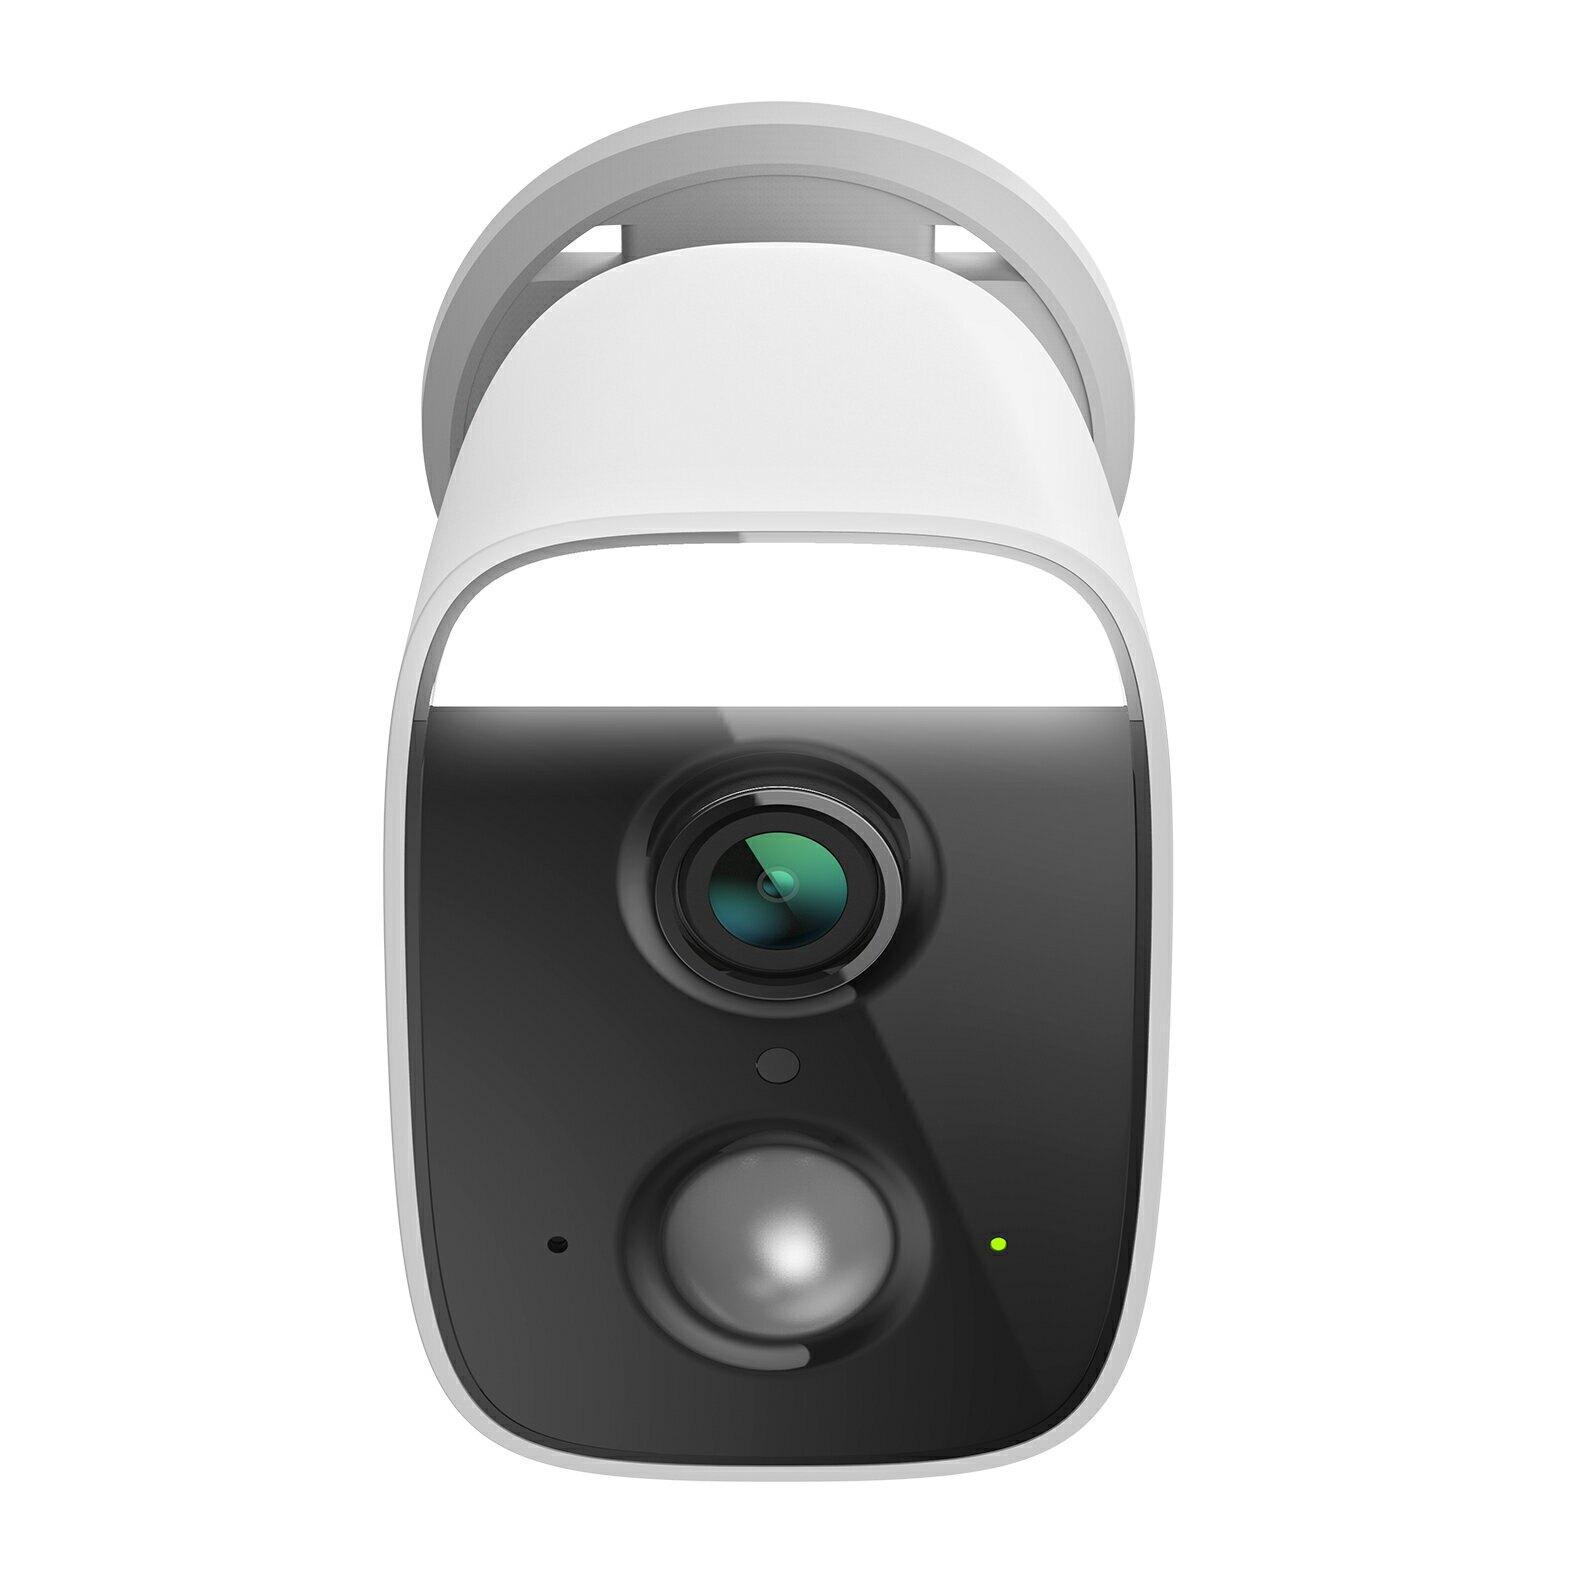 【D-Link 友訊】Full HD 戶外自動照明網路攝影機(DCS-8630LH)【三井3C】